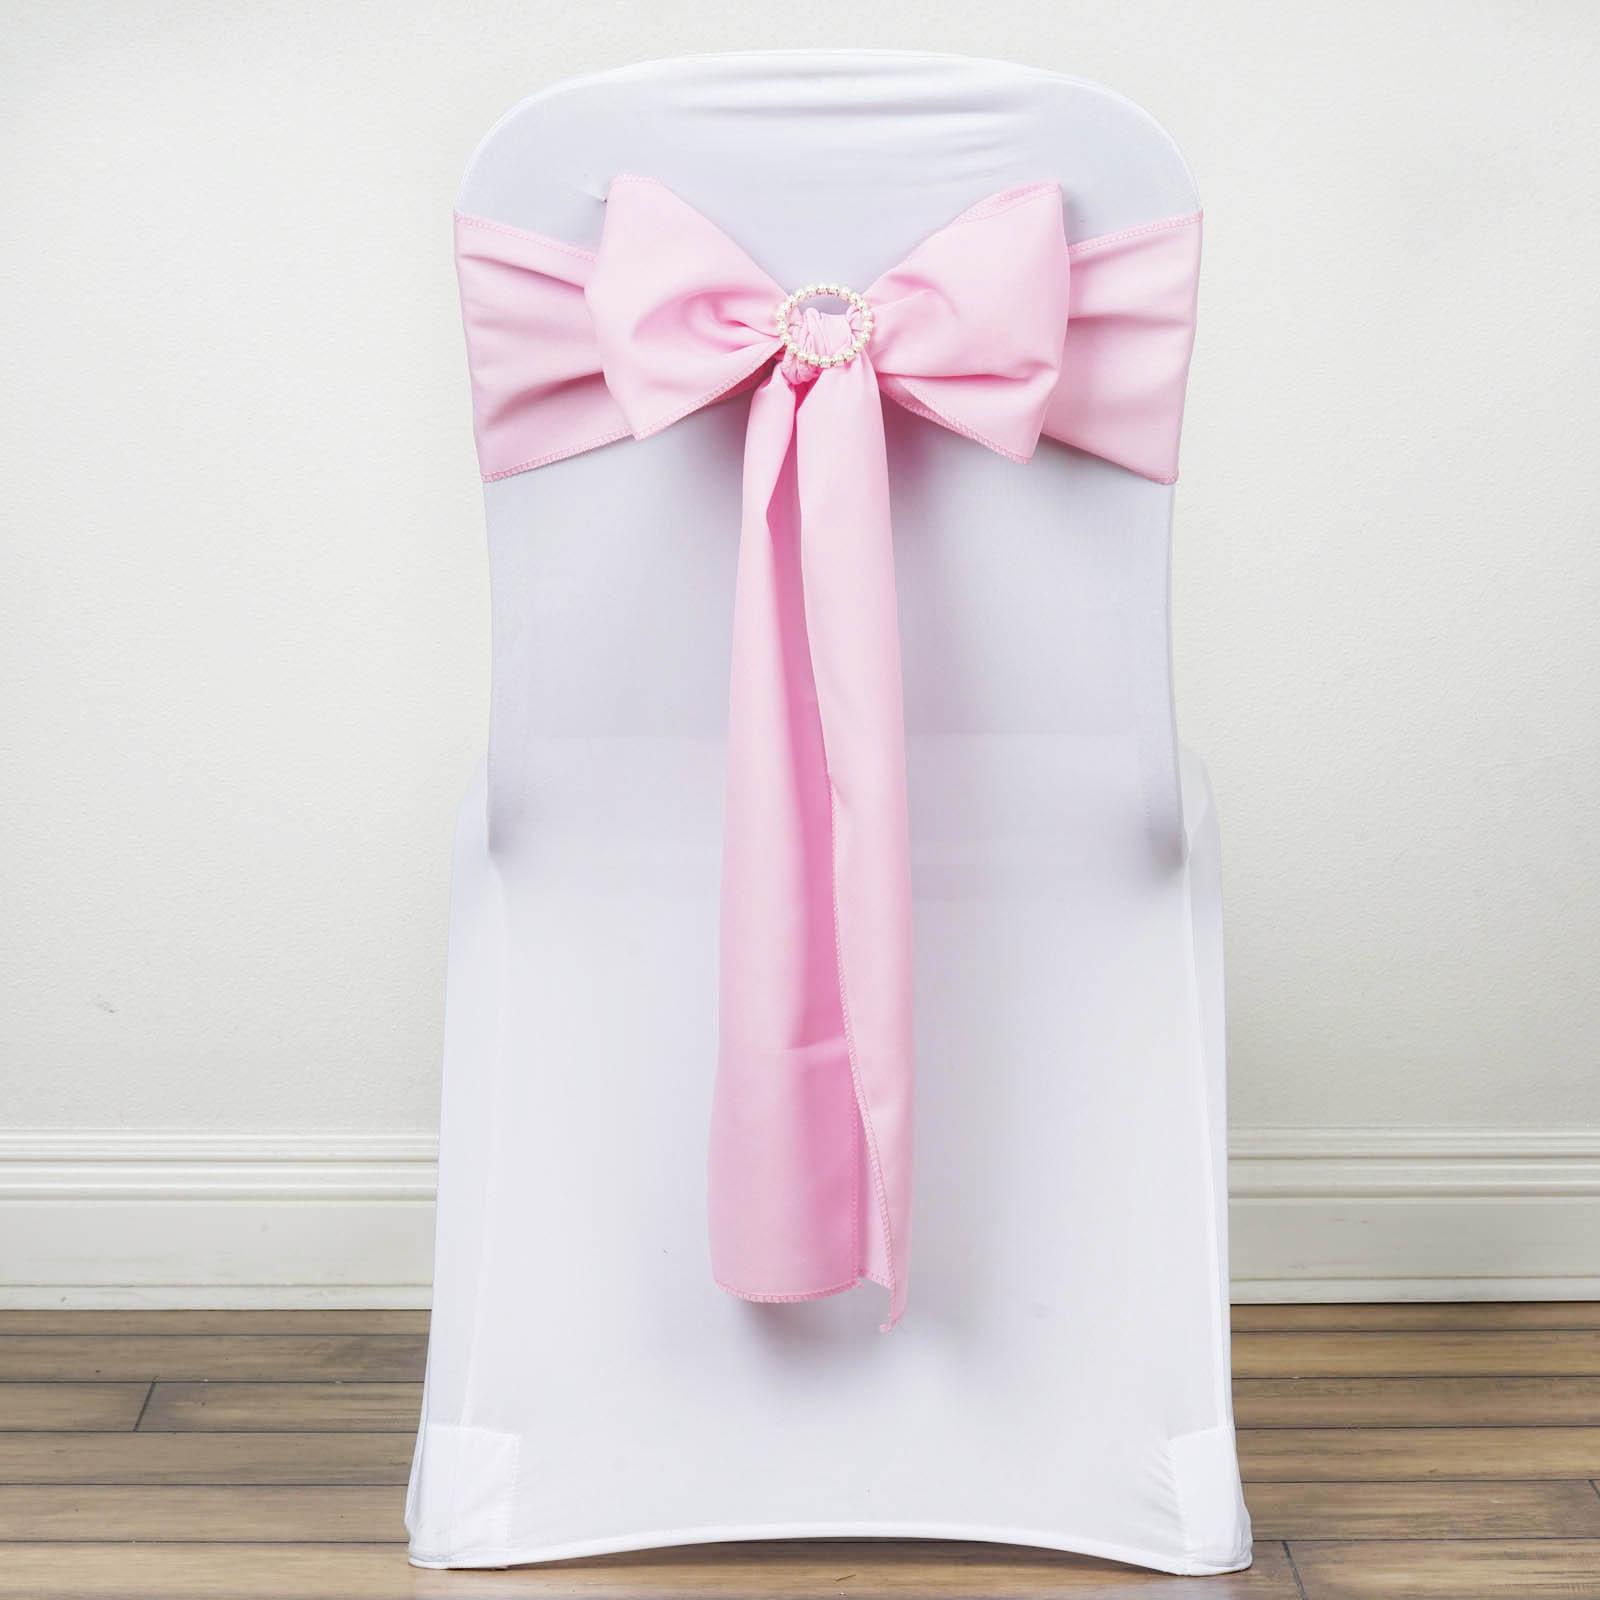 100 Polyester CHAIR SASHES Bows Ties Wedding Party Supplies Wholesale Discoun